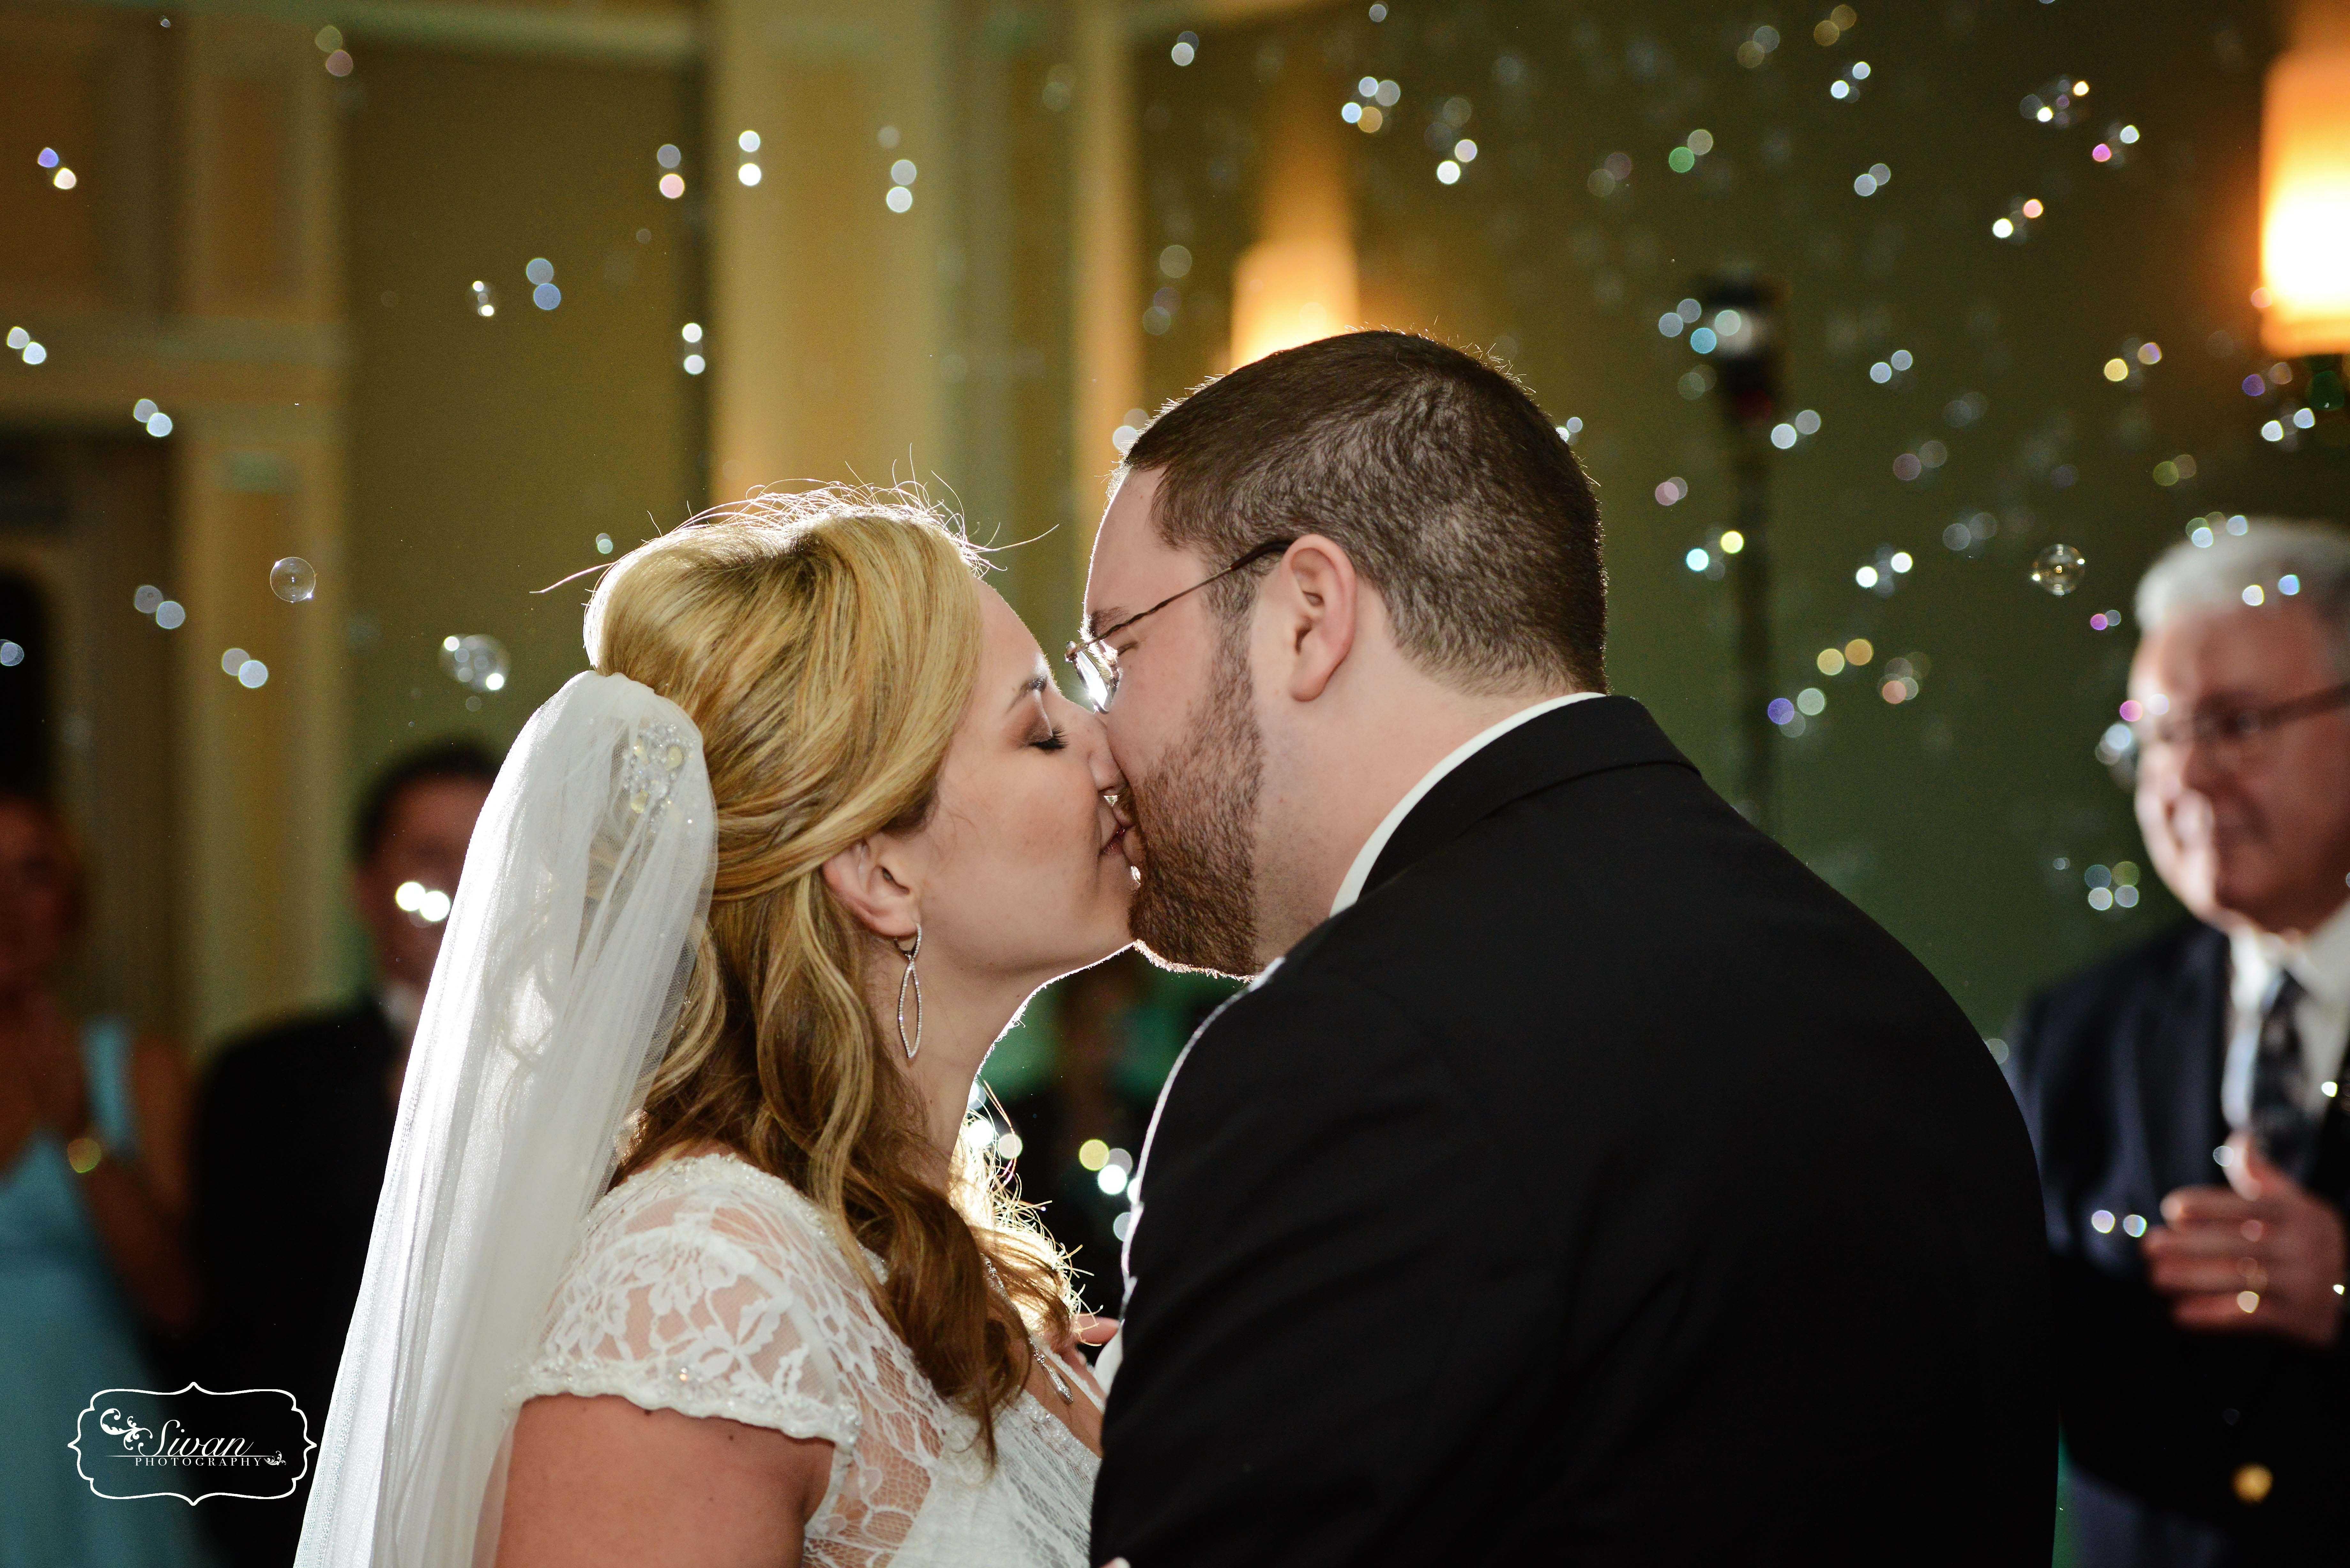 Bubbles! Leu Gardens Wedding - Colleen & Geoff Teal uplighting ...